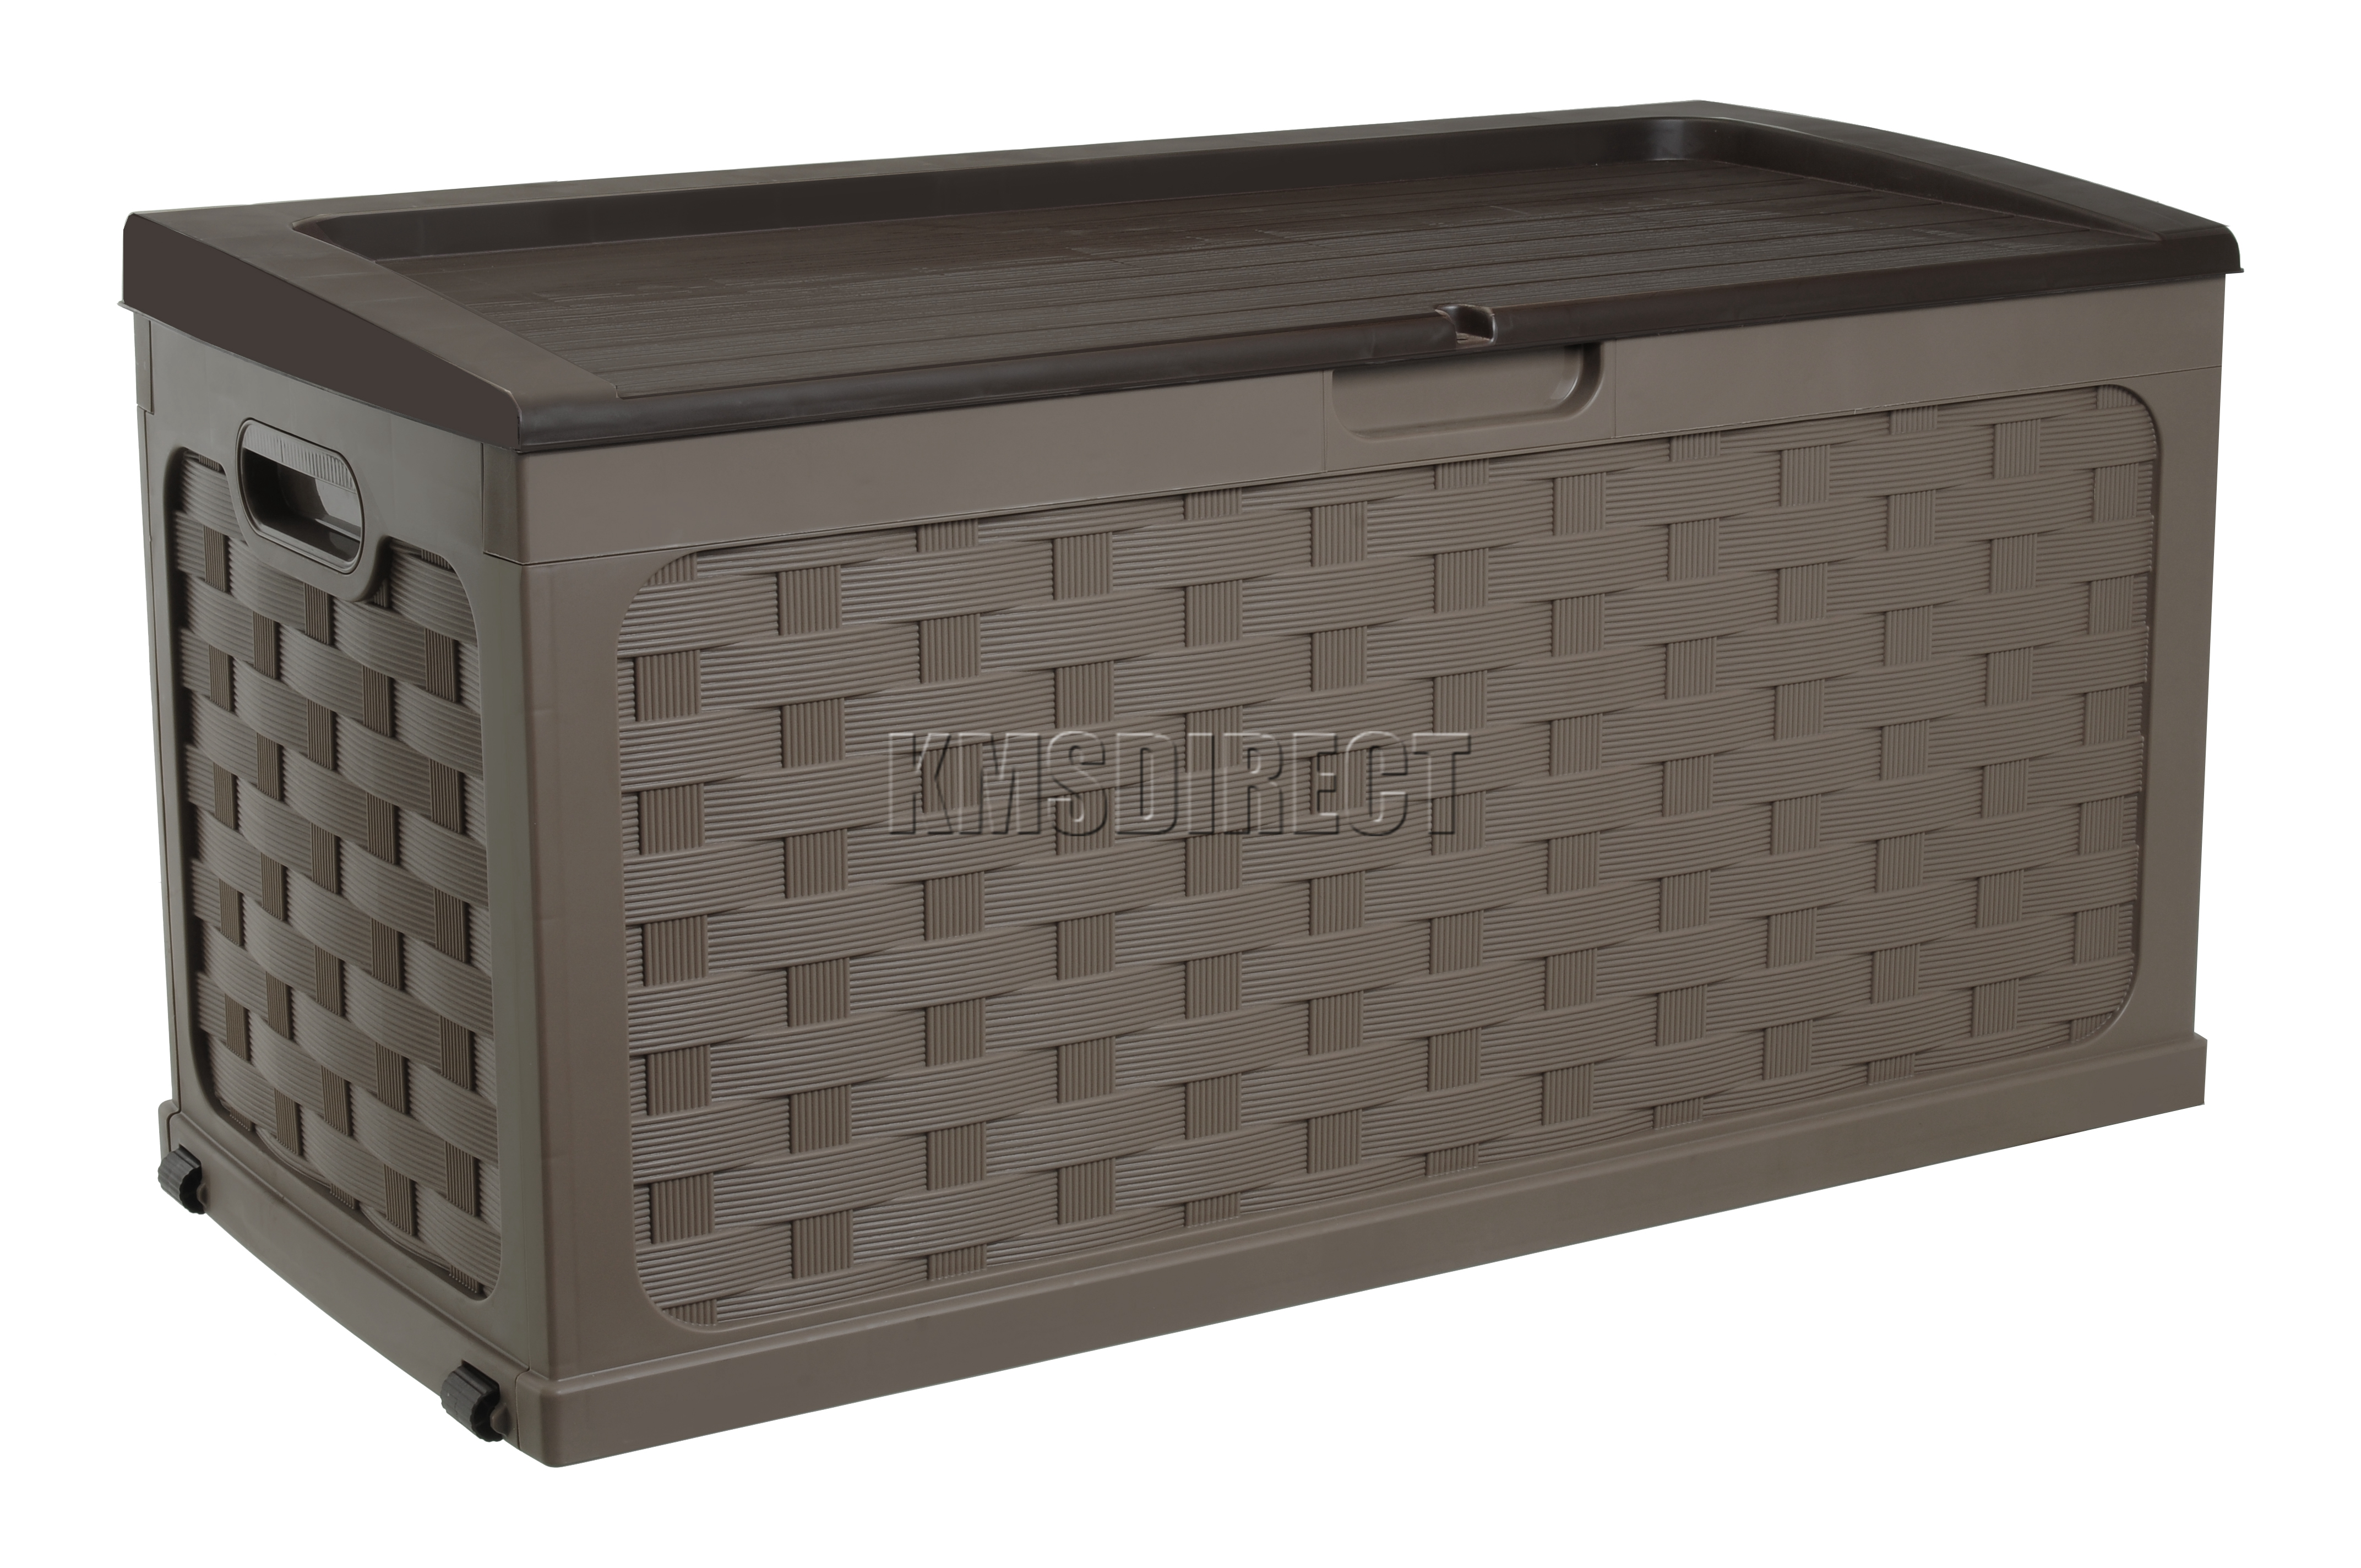 starplast jardin rotin style plastique coffre rangement table boite d couvercle ebay. Black Bedroom Furniture Sets. Home Design Ideas